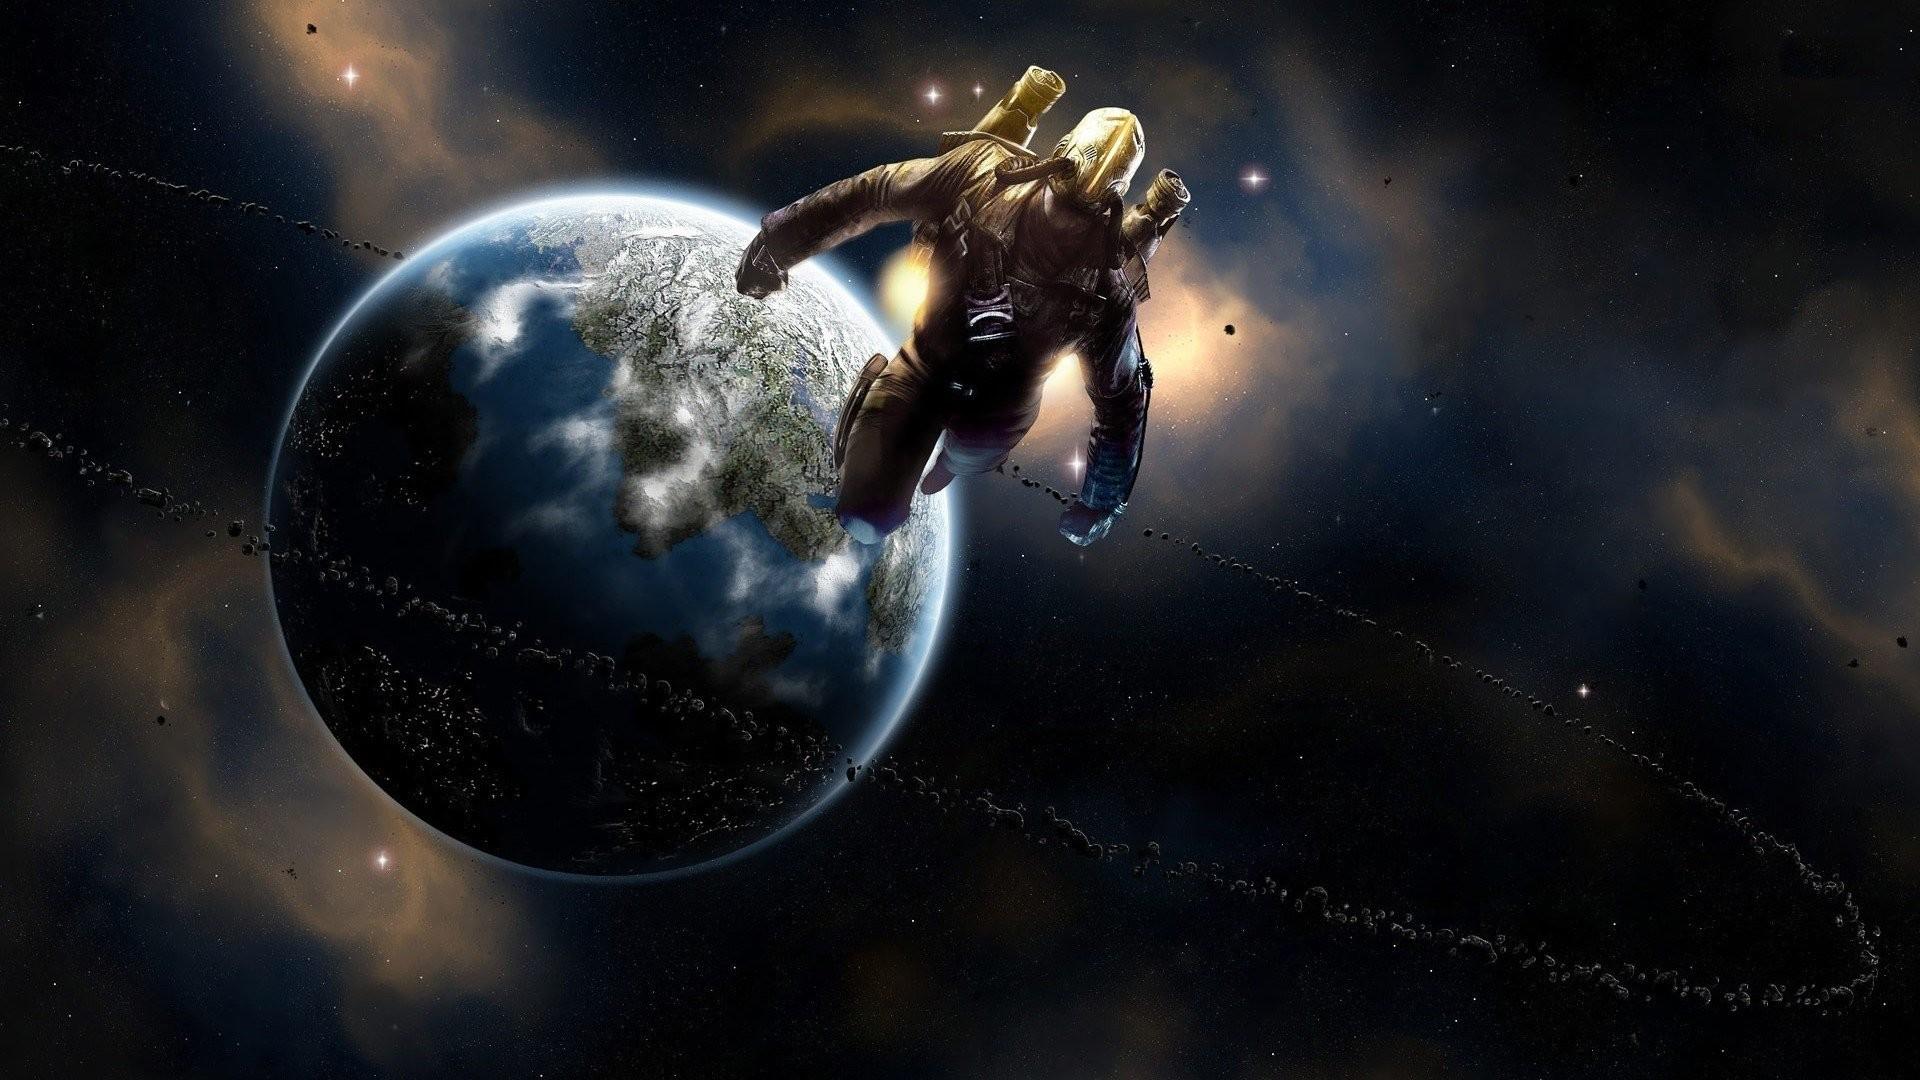 Artwork Digital Art Fantasy Planets Stars Space Dark Void